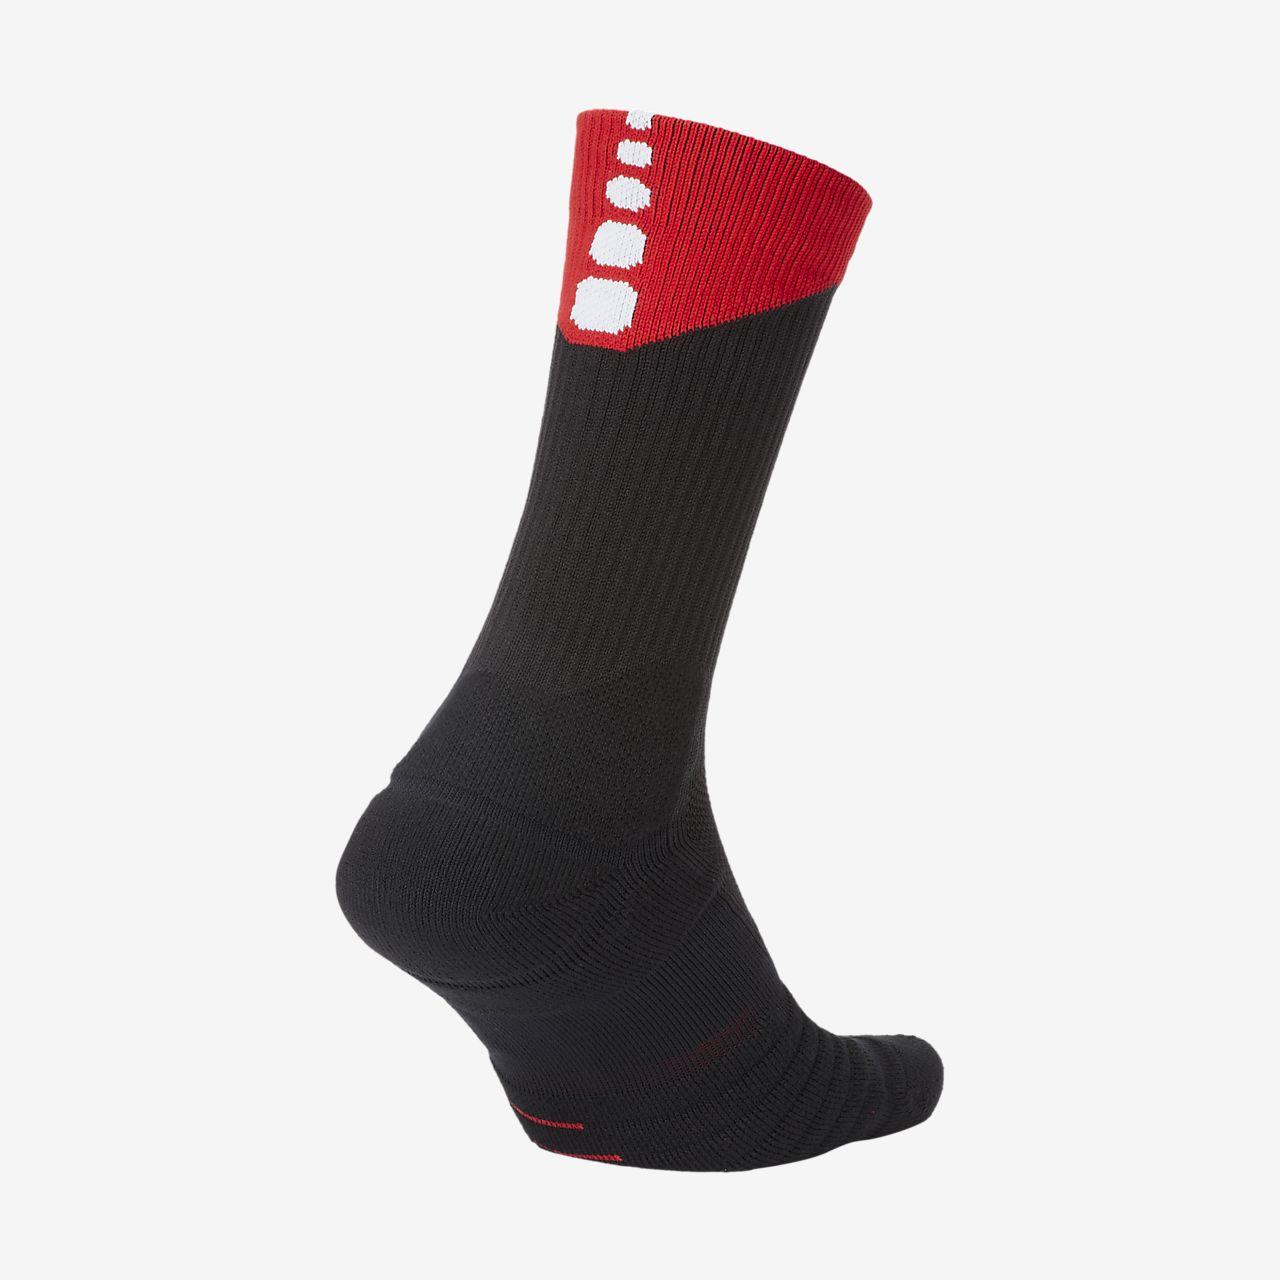 30dffc145f2 Nike Elite Quick Crew NBA Socks. Nike.com PT